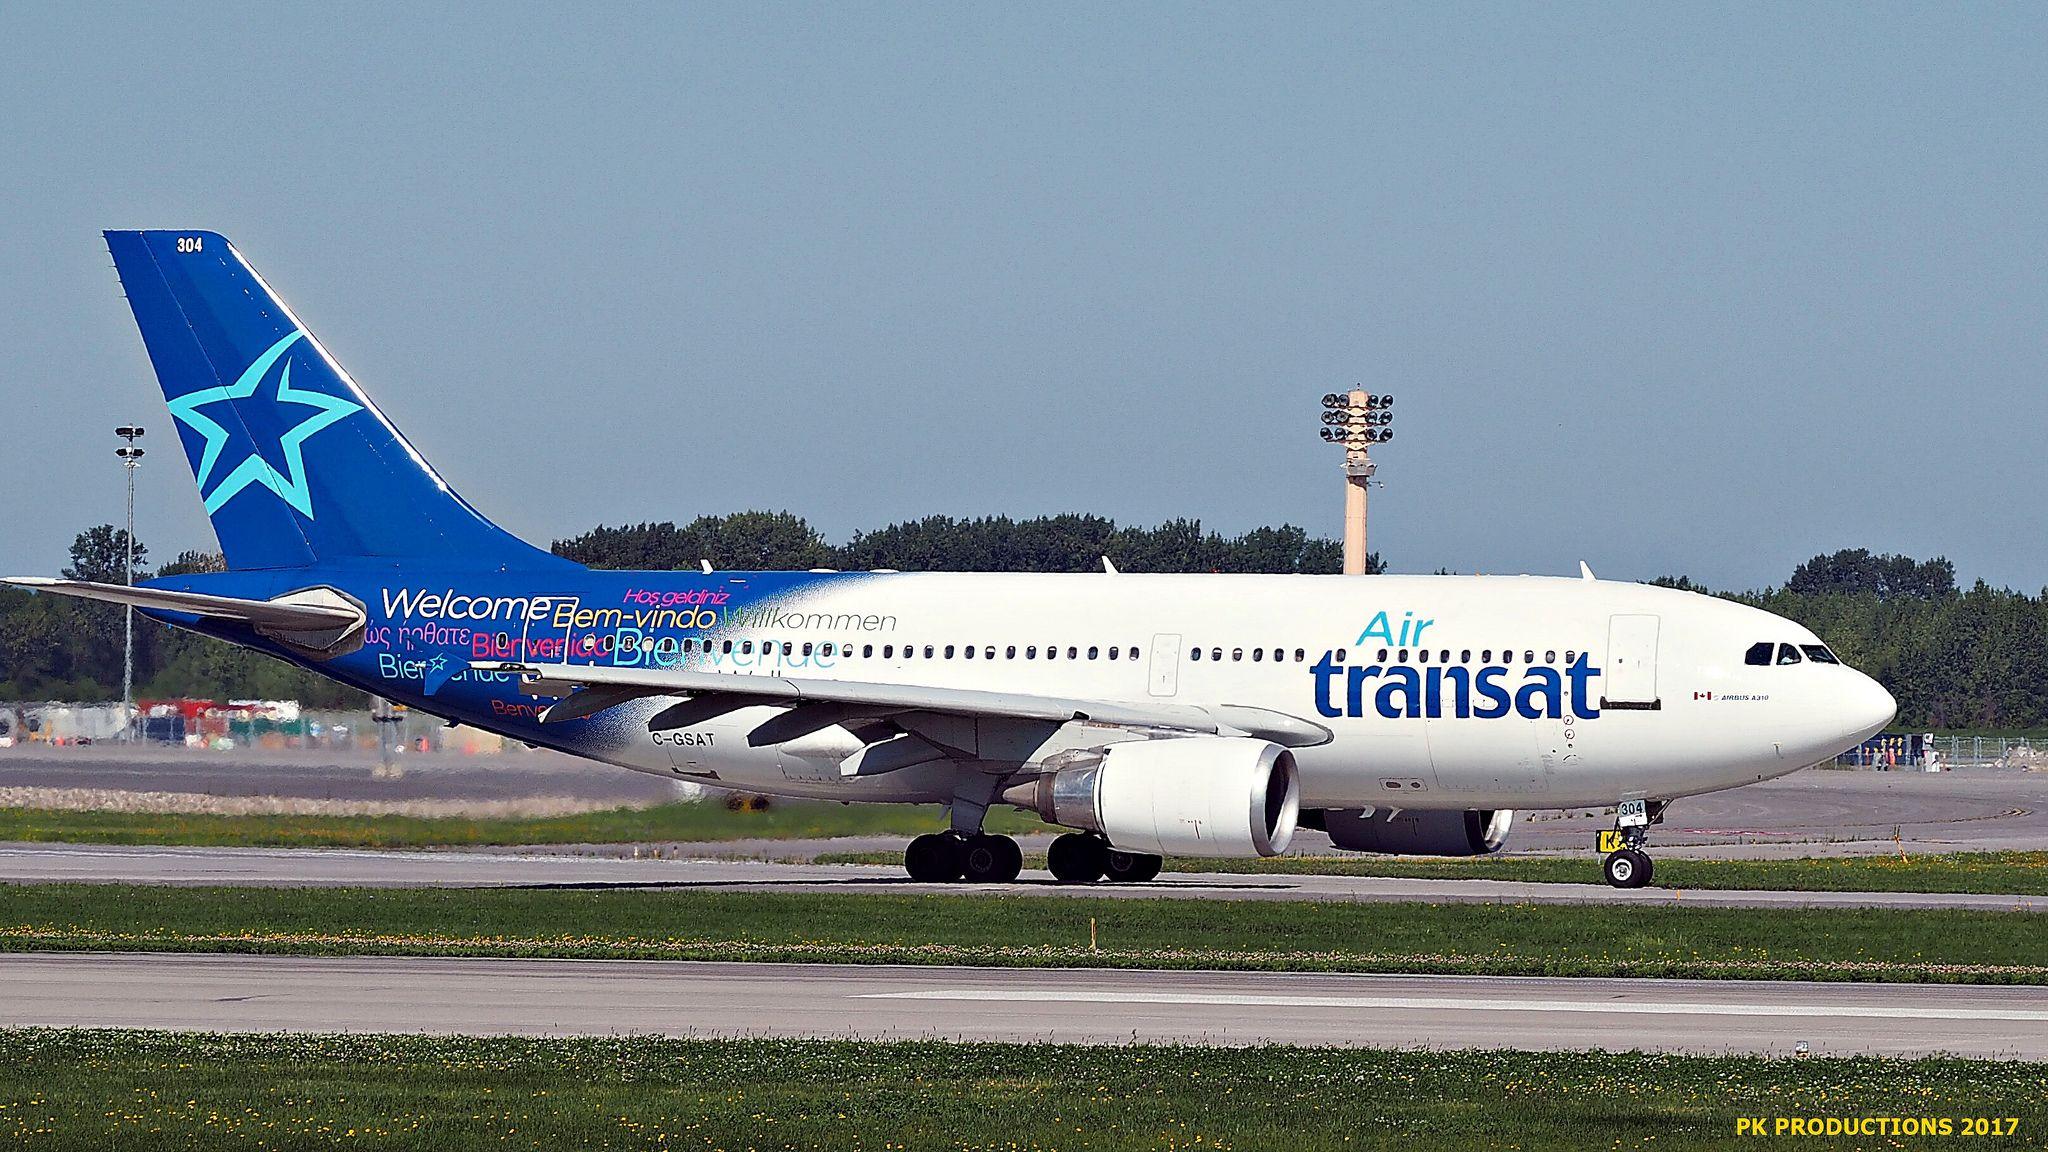 P8131340 TRUDEAU Air transat, Aircraft